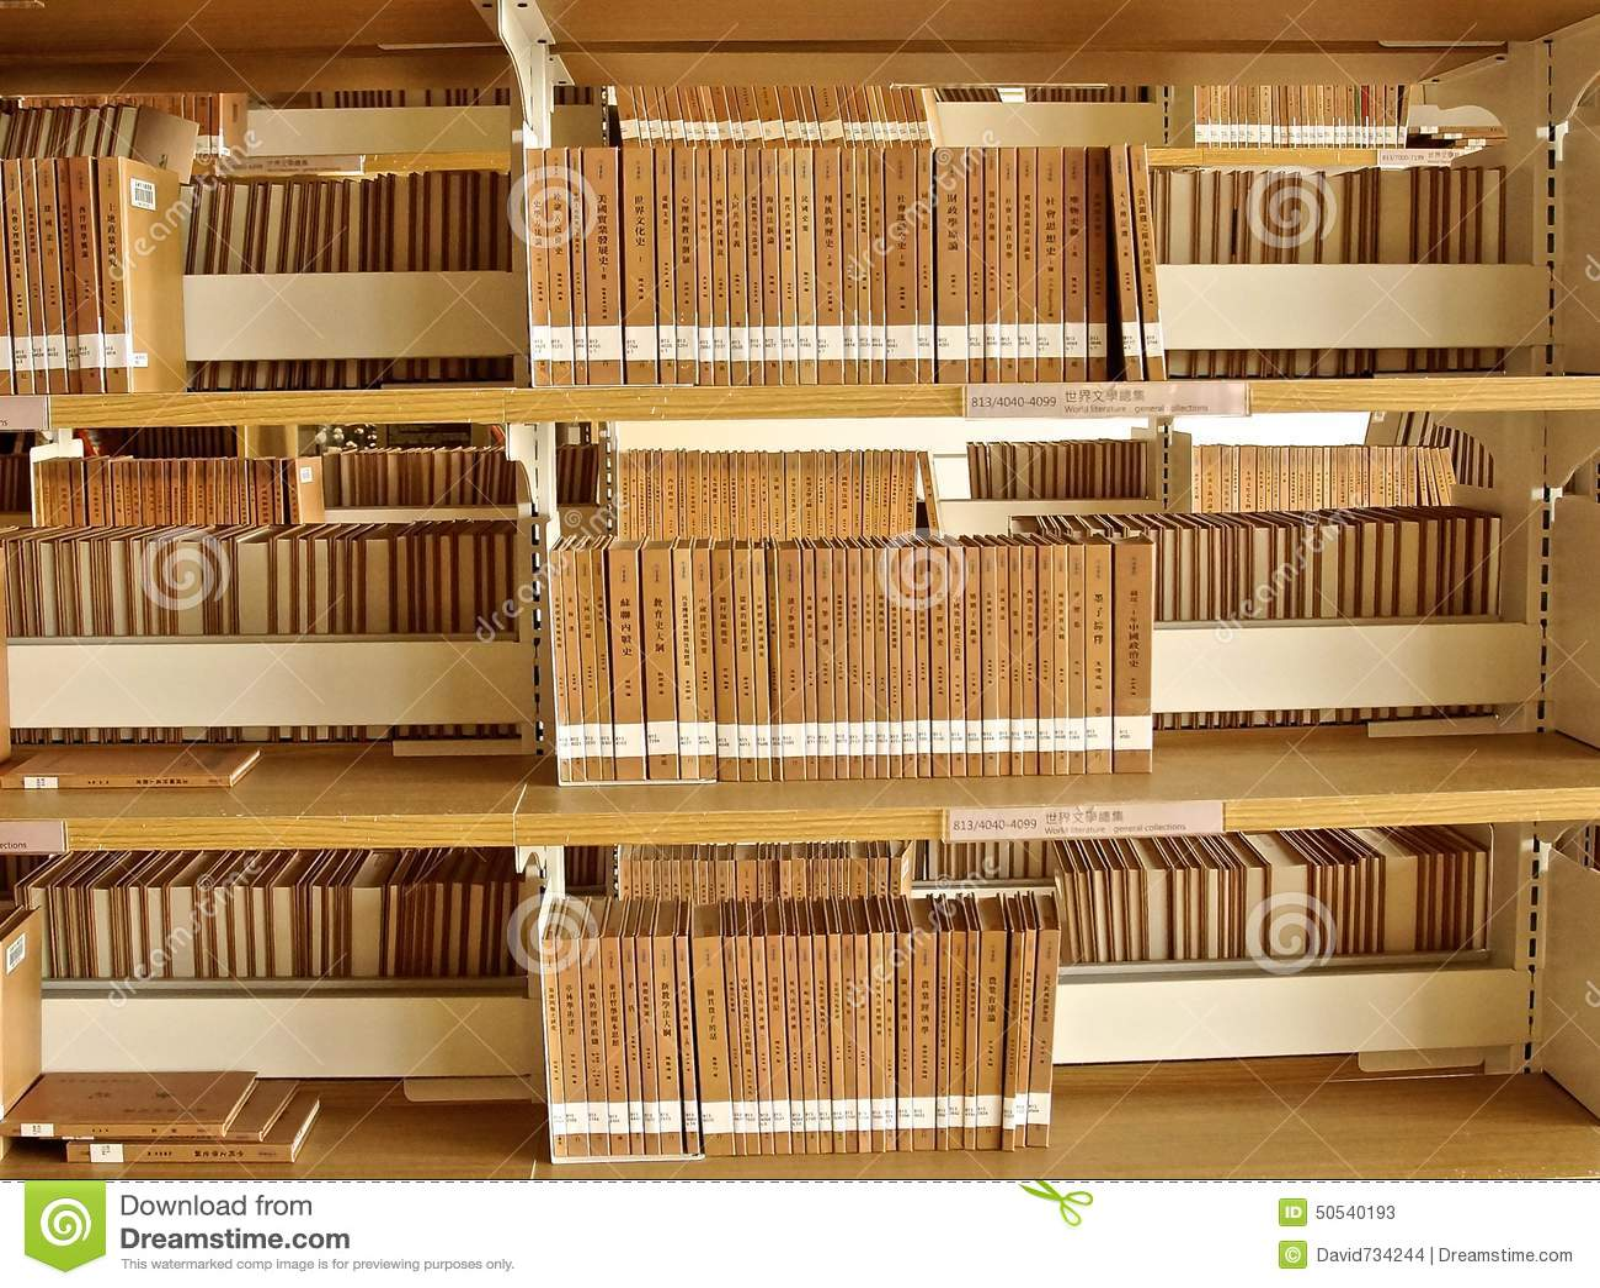 la vue troite d 39 une biblioth que municipale photo stock image 50540193. Black Bedroom Furniture Sets. Home Design Ideas